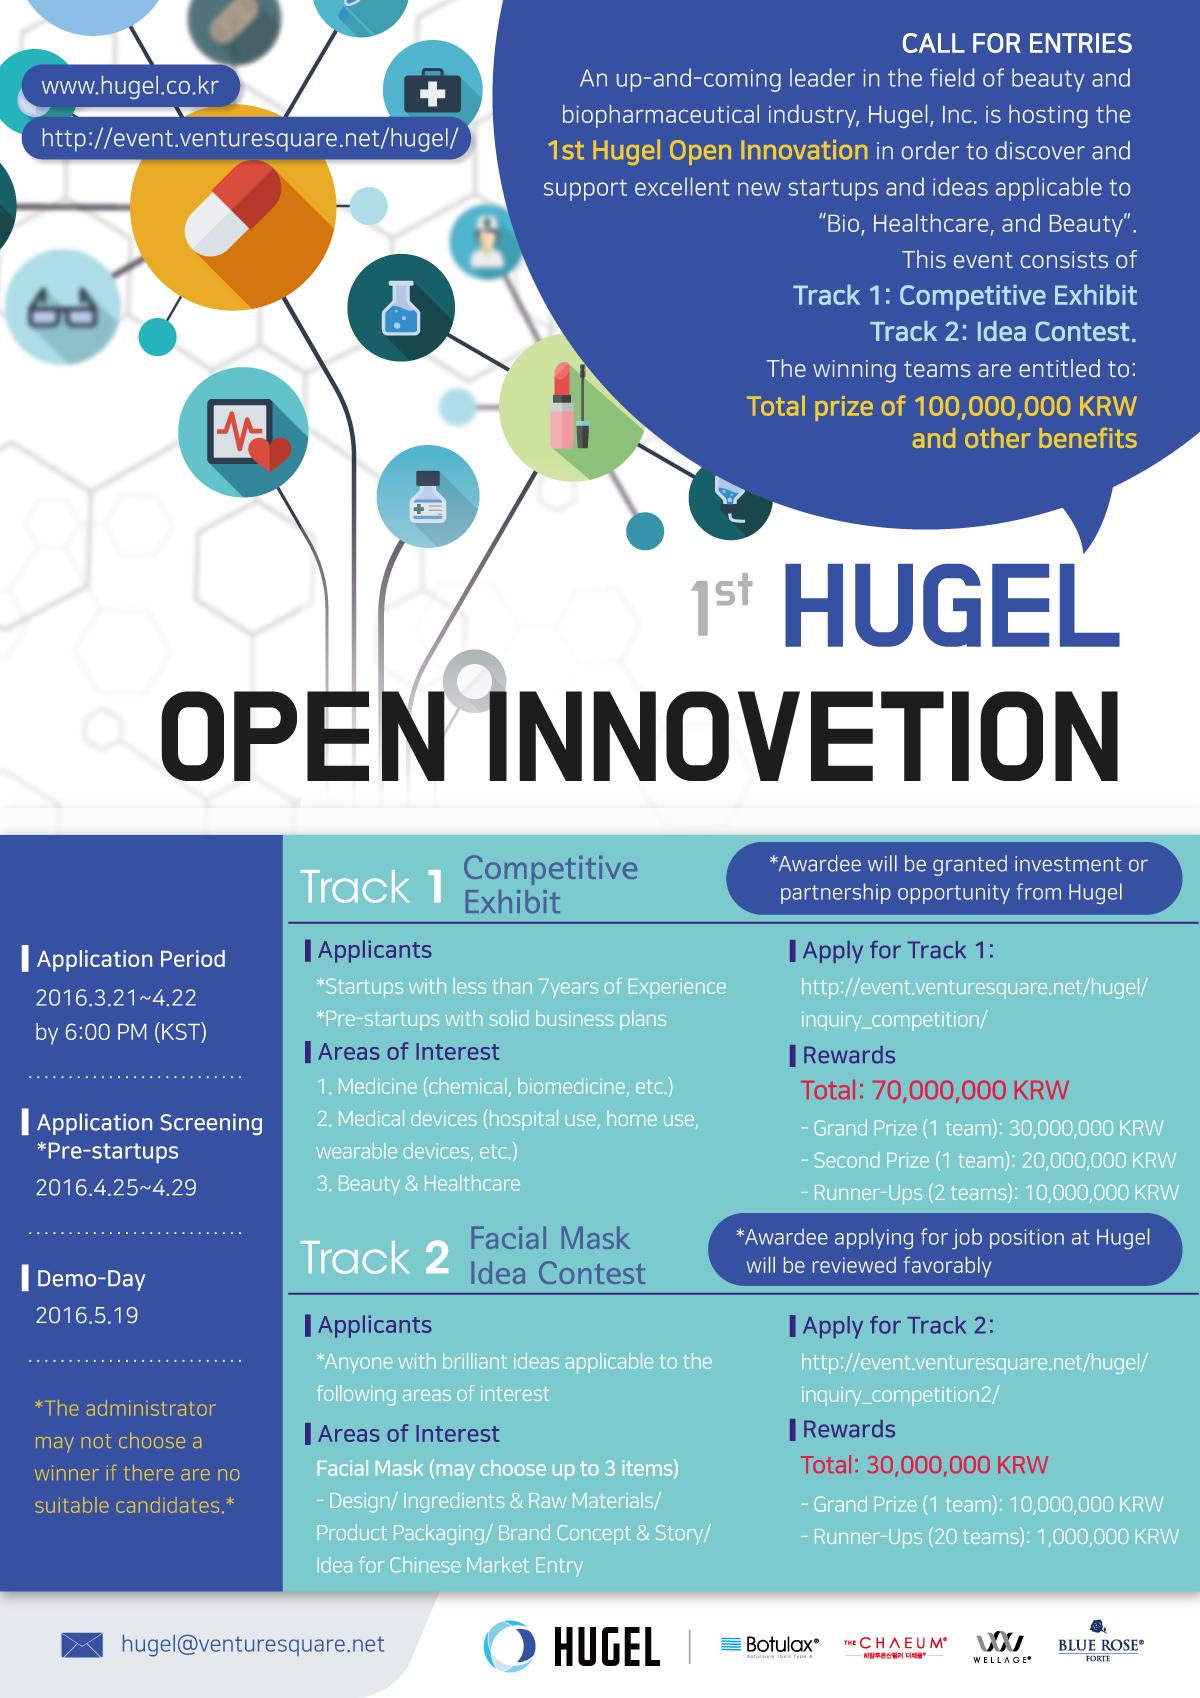 1st Hugel Open Innovation Poster - ENG